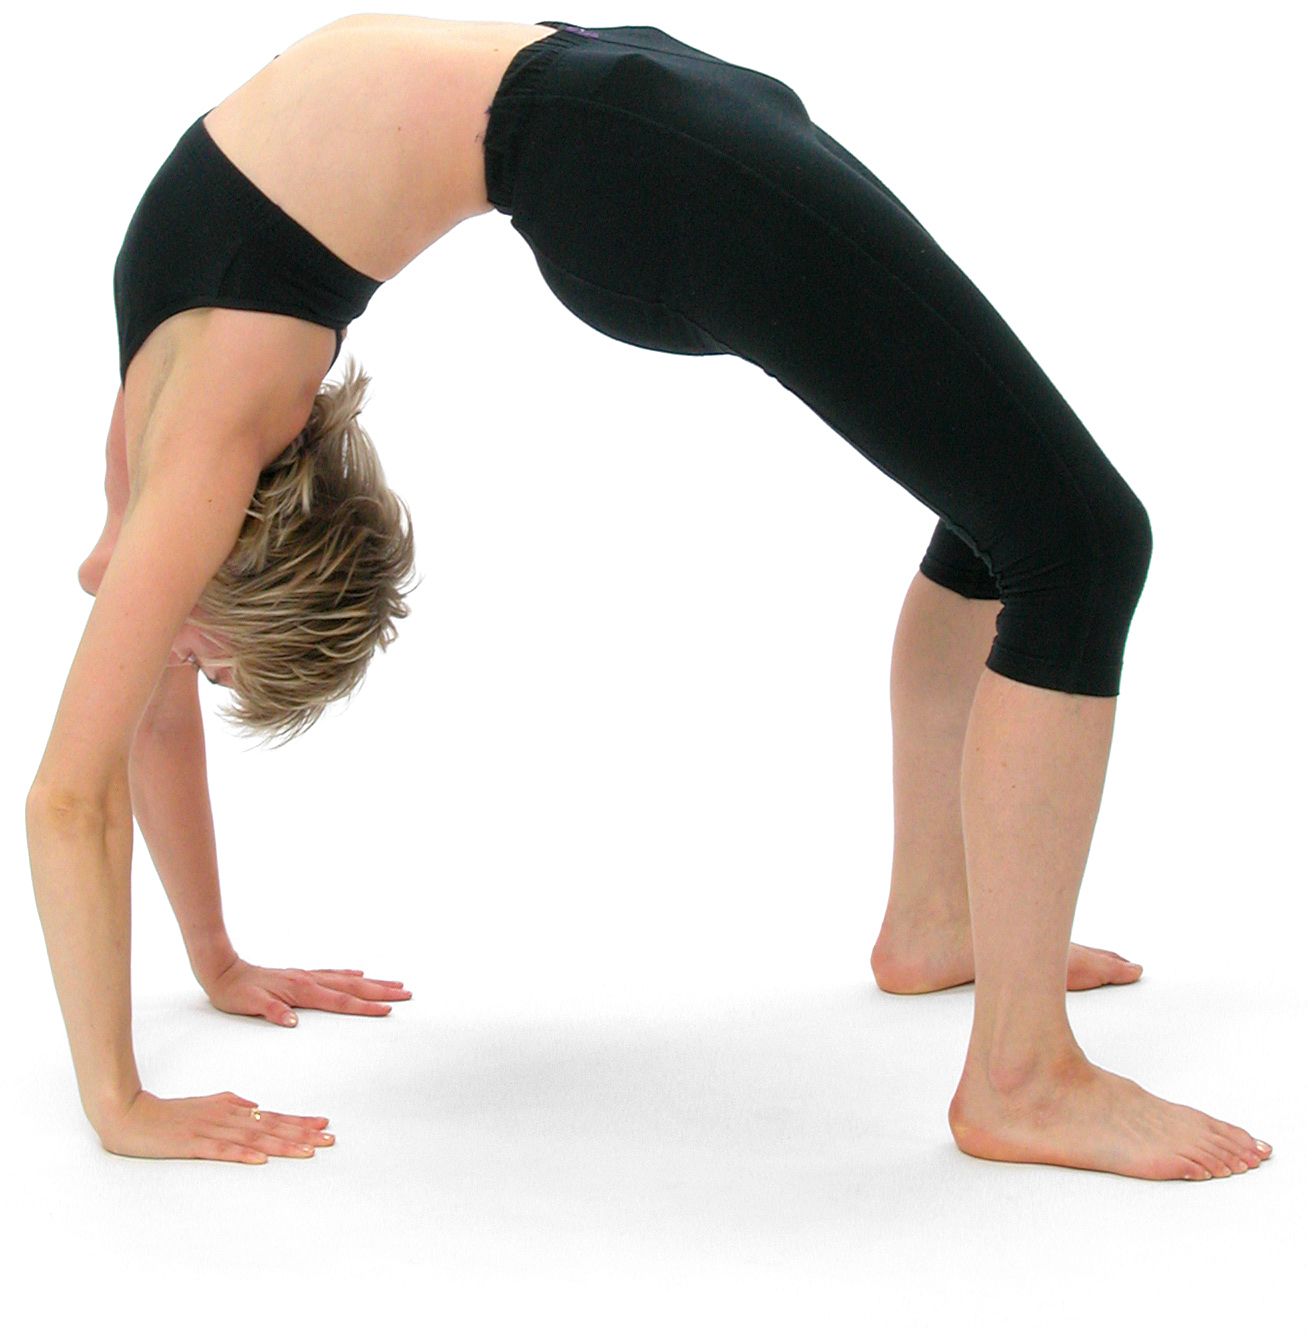 Figure 11: Bianca Machliss in Urdhva Dhanurasana ('Inverted wheel posture') (photo courtesy Alejandro Rolandi)